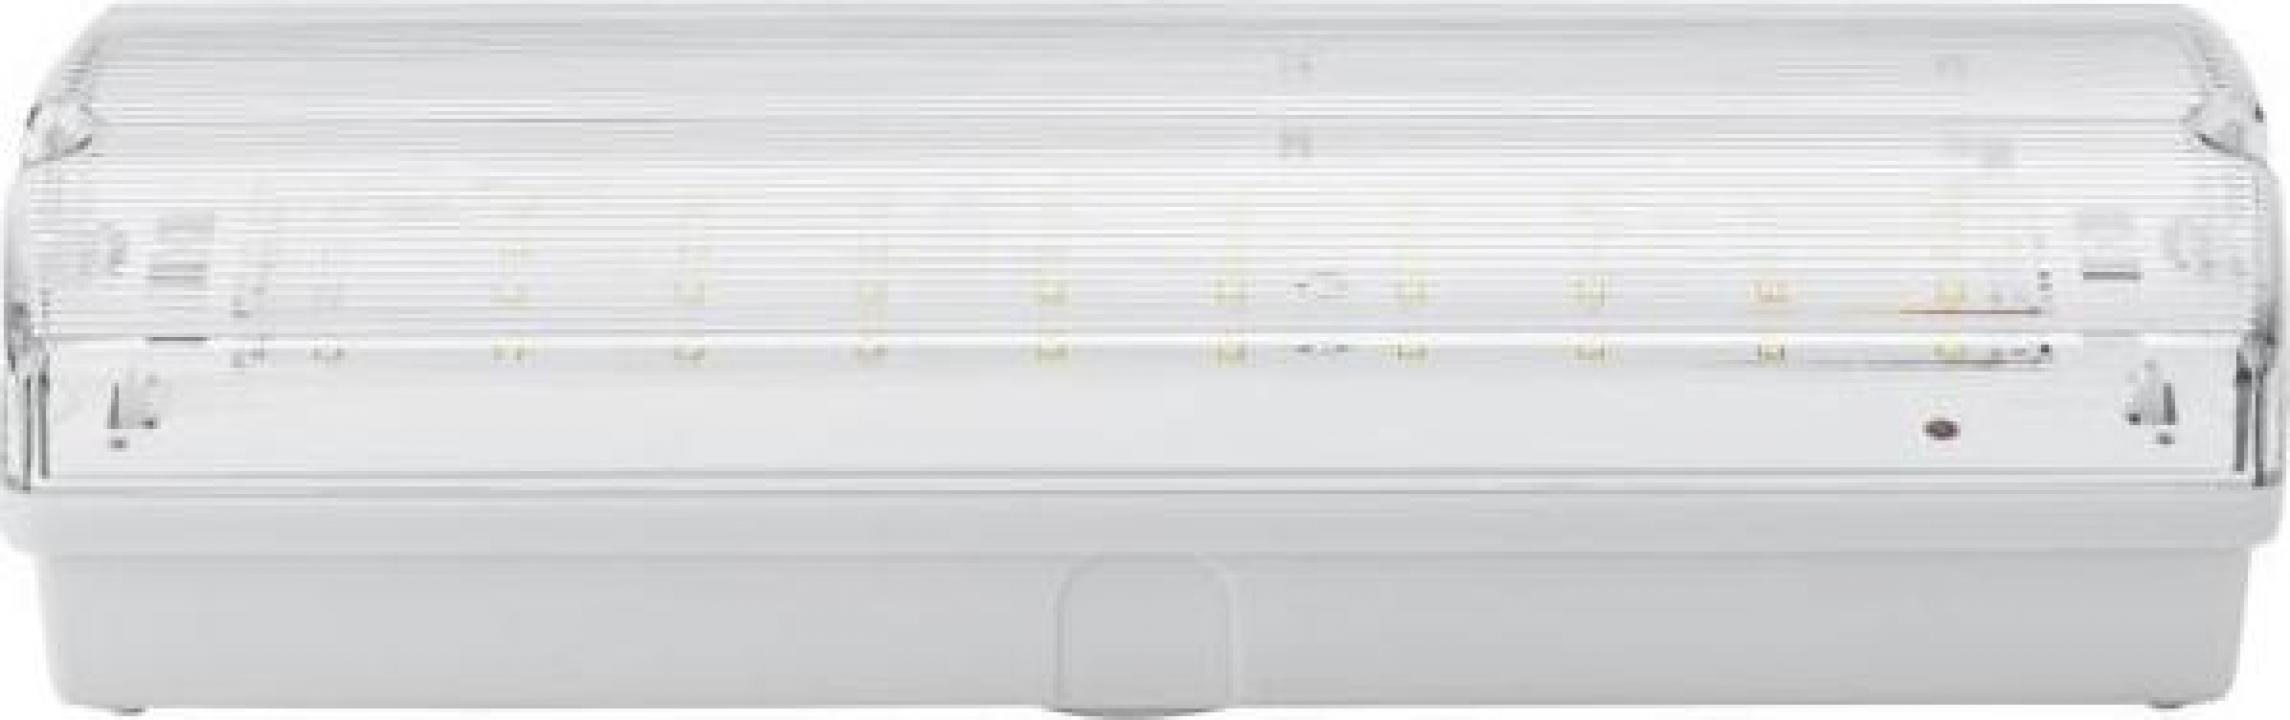 Corp iluminat de siguranta cu LED 3W 30xLED, Well